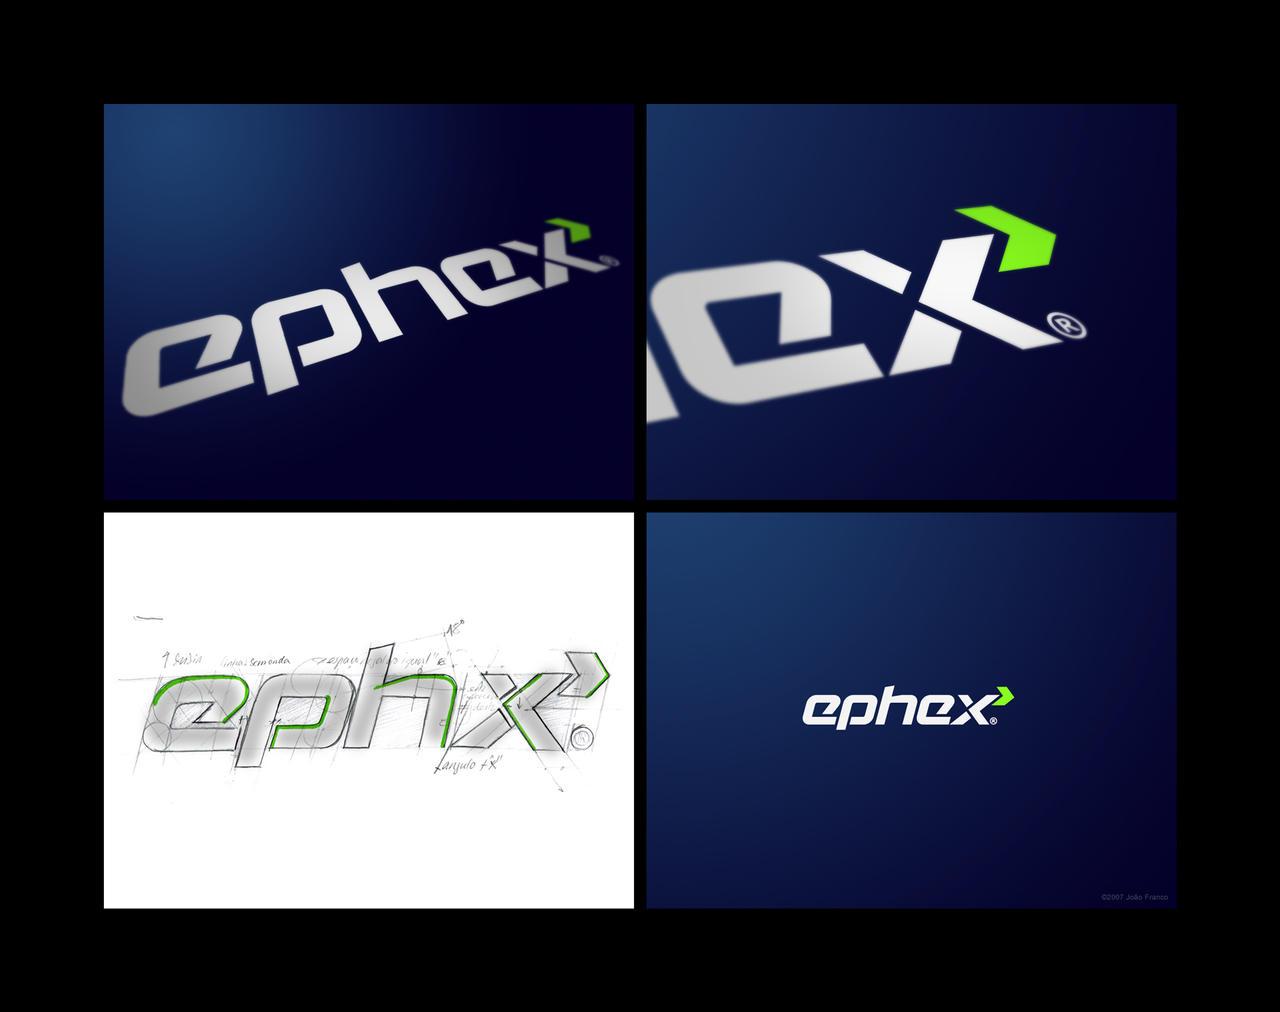 ephex logo